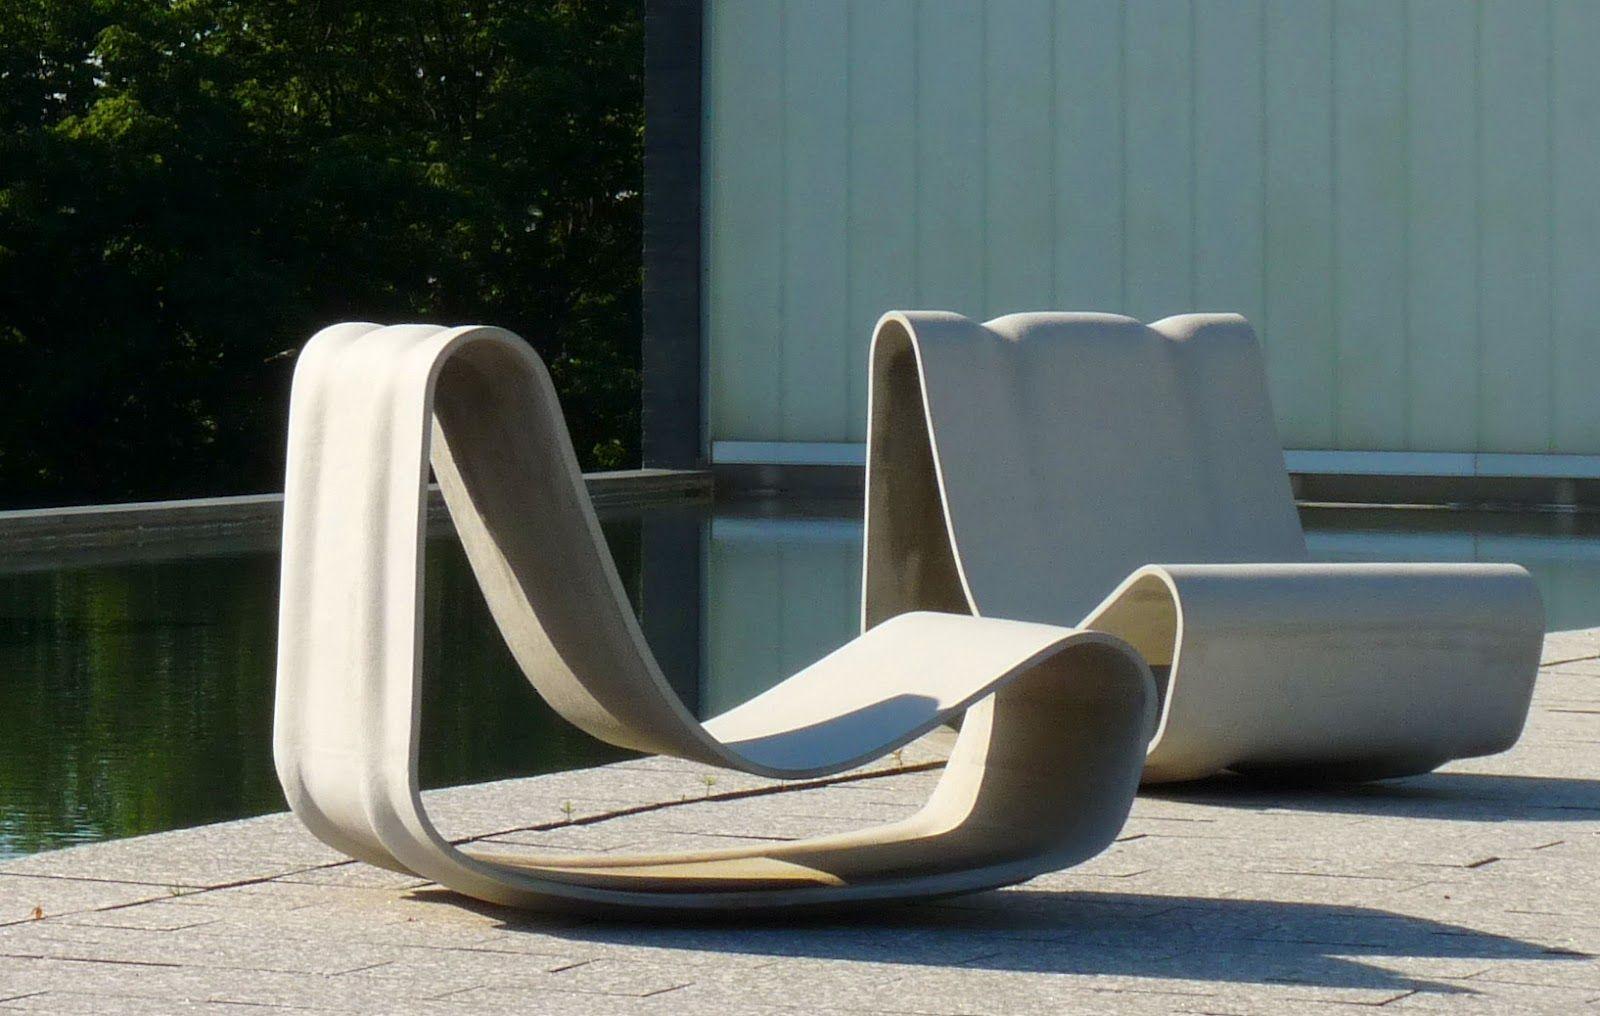 17 Modern Outdoor Furniture: Amazing Layout Ideas | TanyakDesign.com